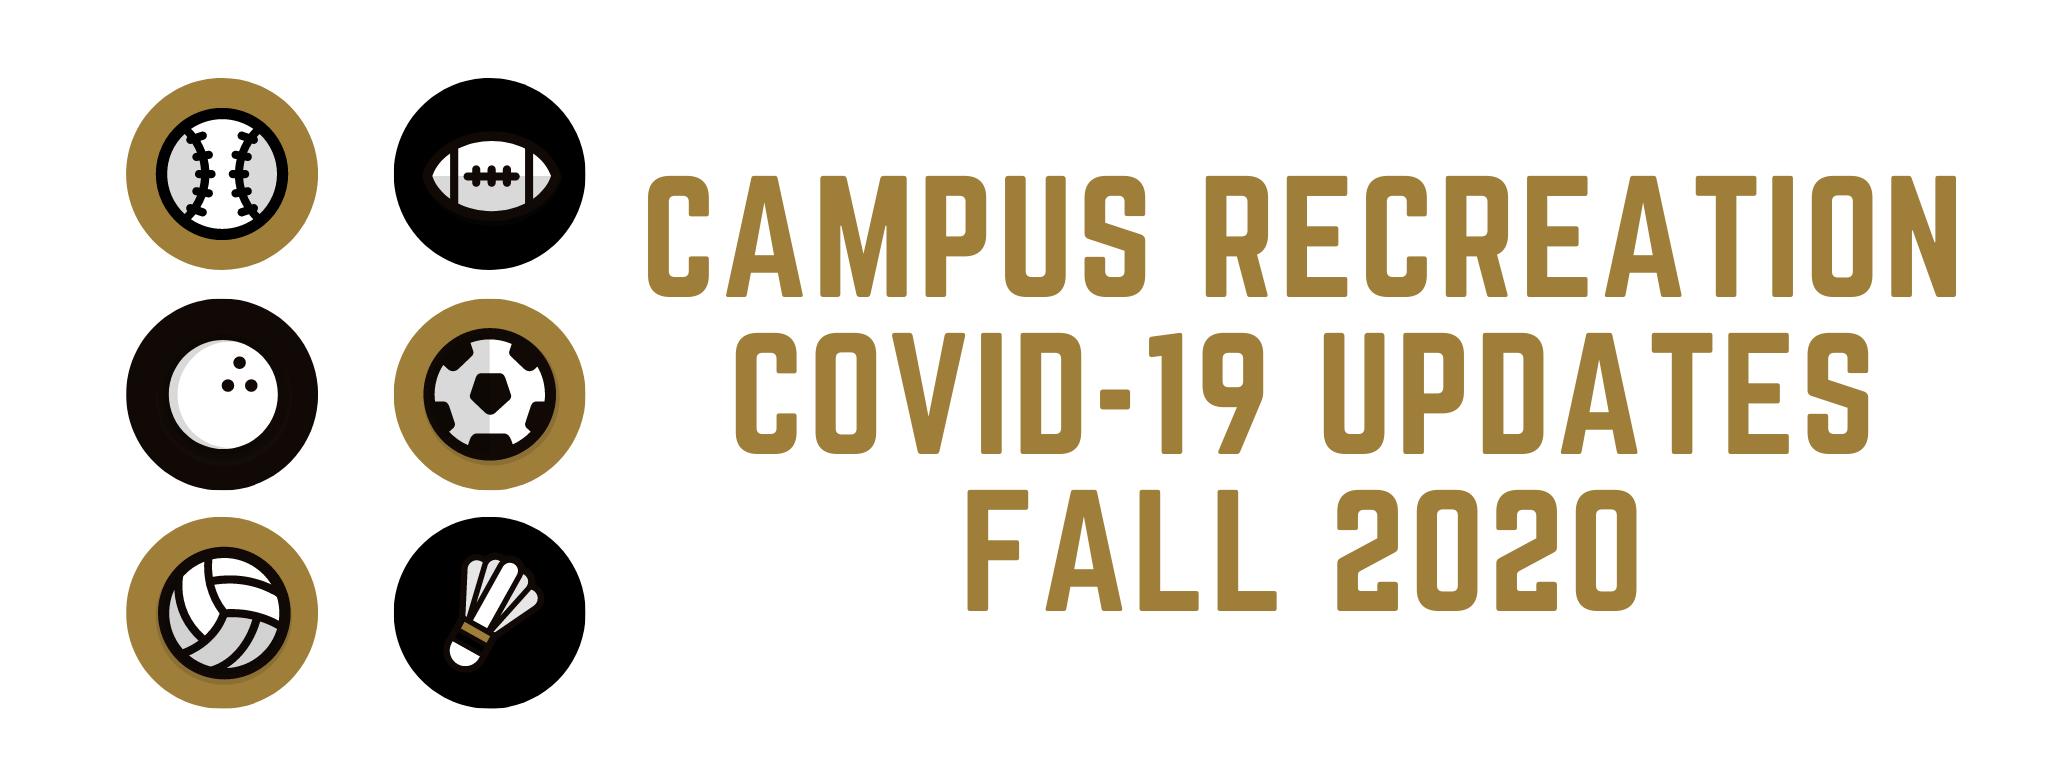 COVID Fall 2020 Updates